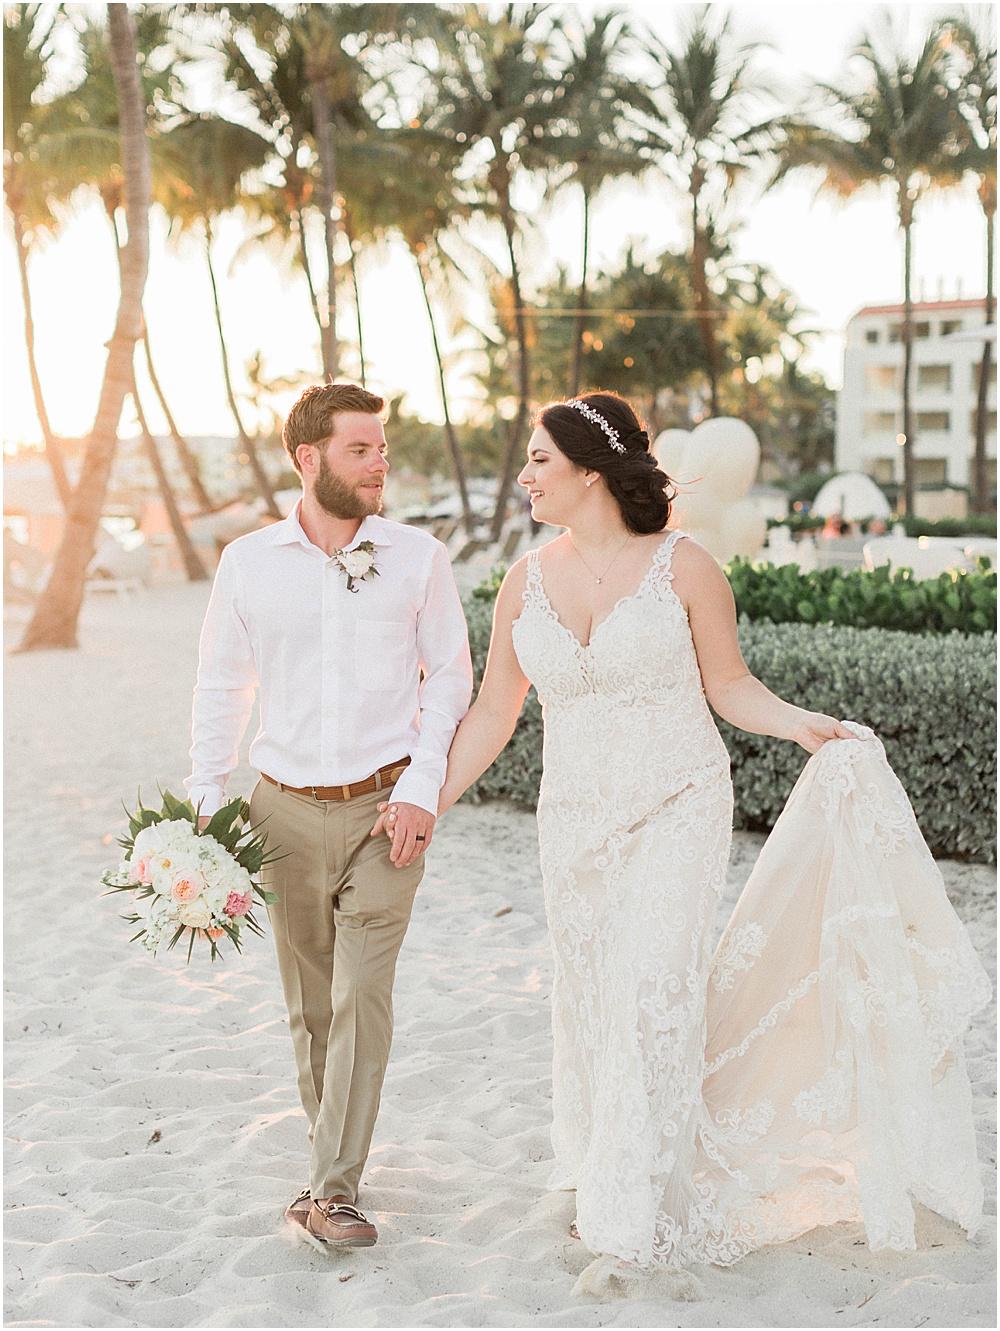 casa_marina_key_west_florida_destination_palm_trees_boston_wedding_photographer_meredith_jane_photography_photo_0109.jpg